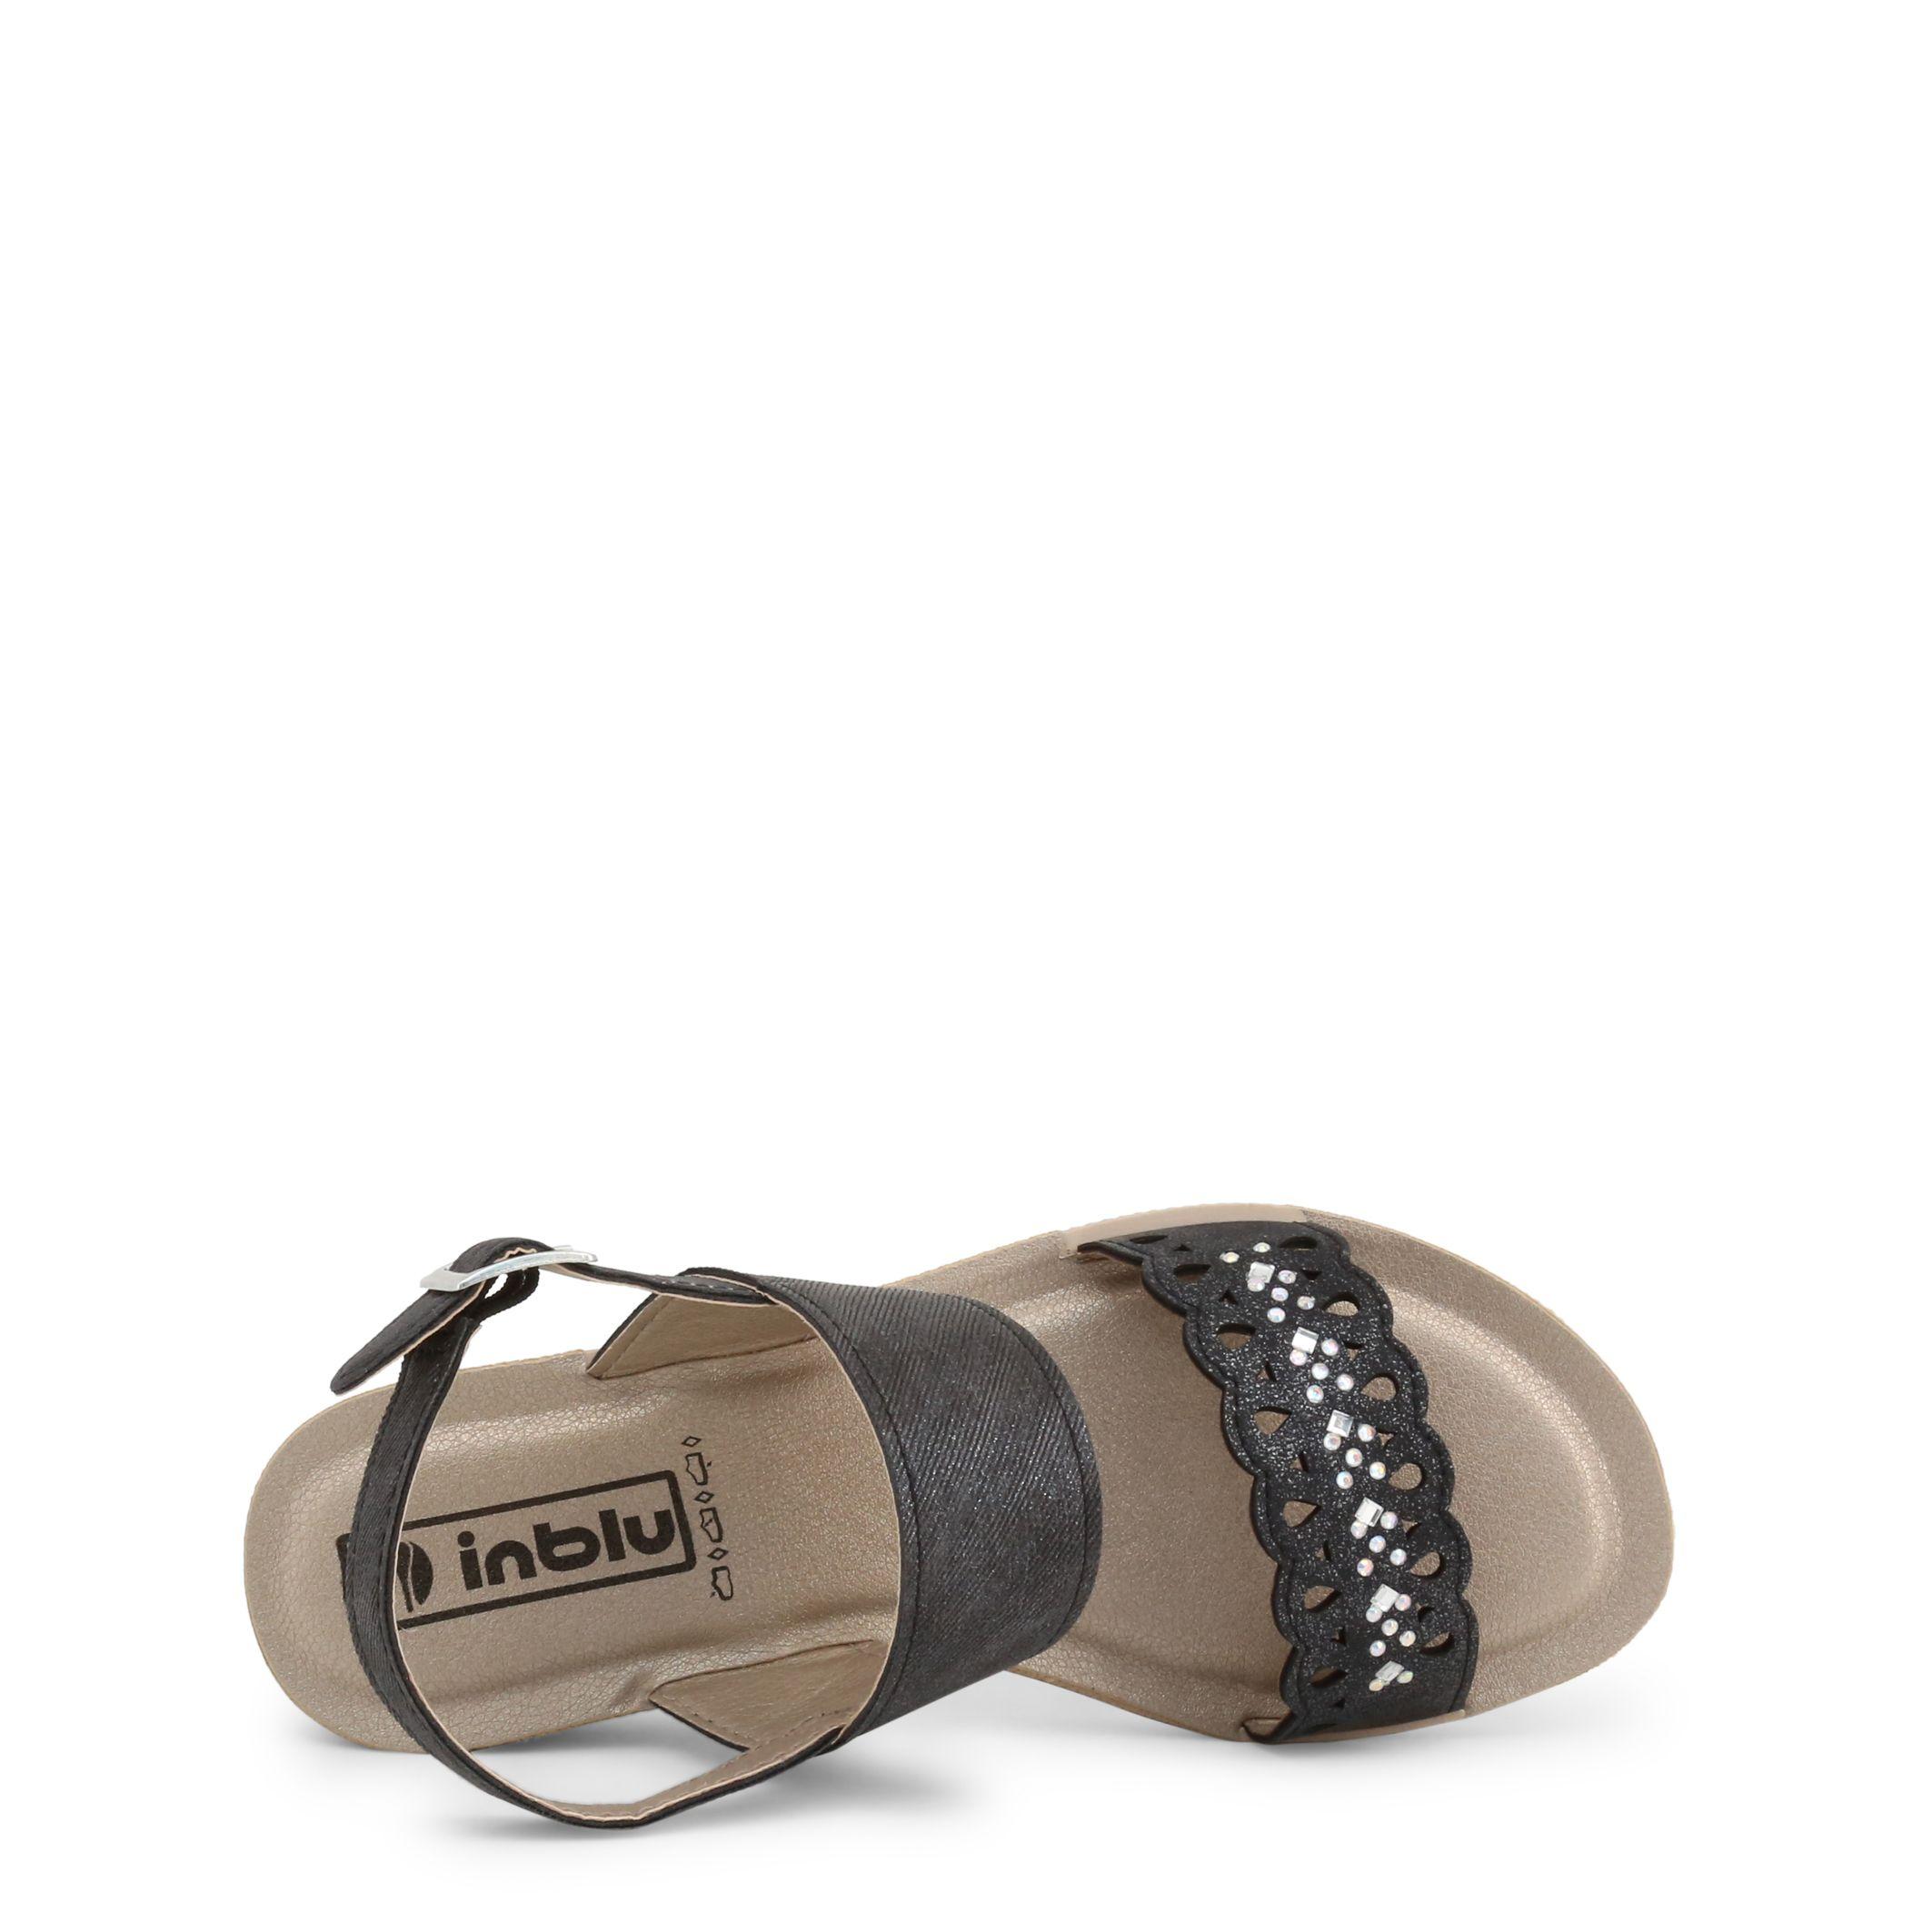 Inblu Womens Sandals